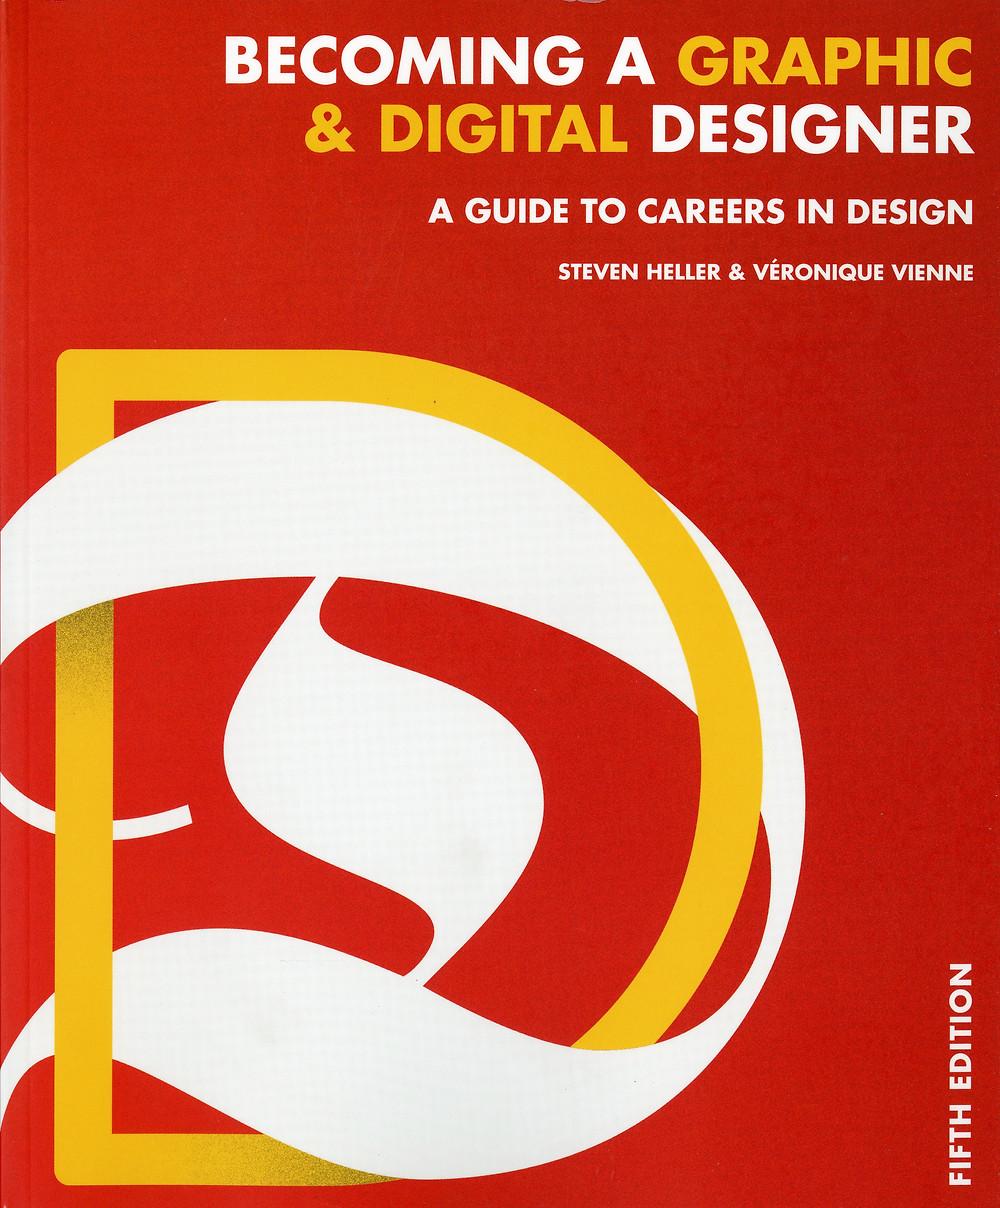 becoming a graphic & digital designer